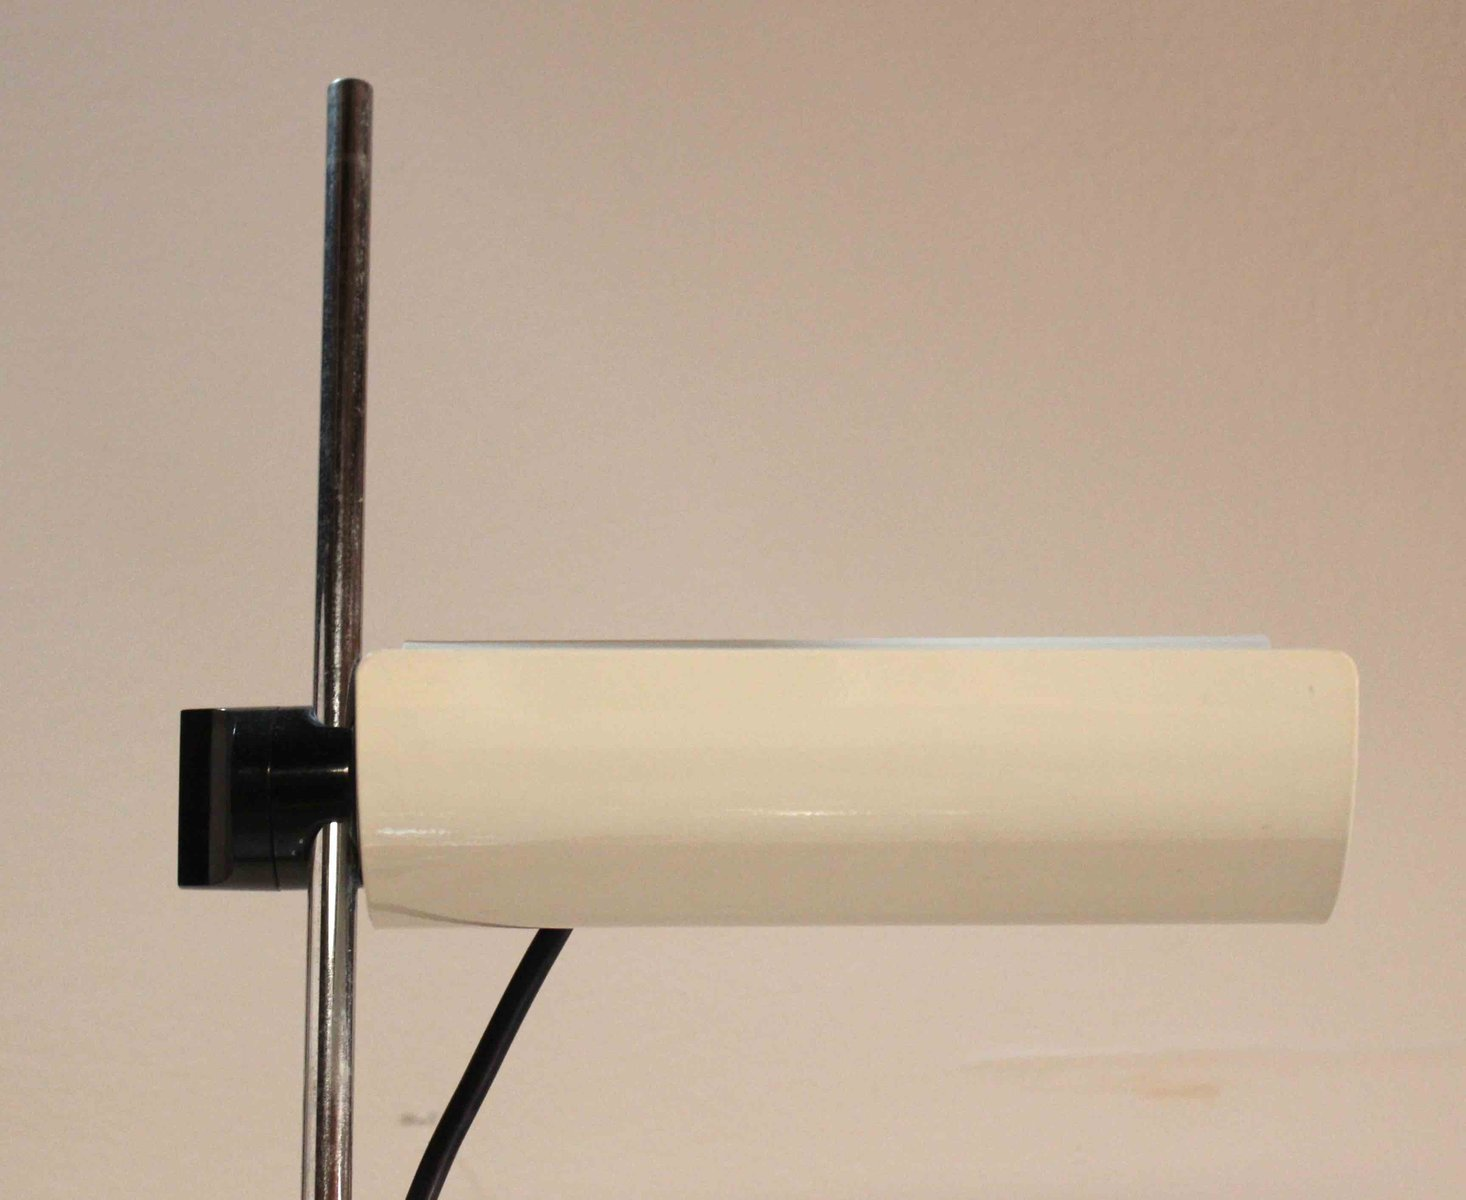 dimmbare stehlampe good trendy stehlampe tageslicht schoene inspiration tageslicht stehlampe. Black Bedroom Furniture Sets. Home Design Ideas